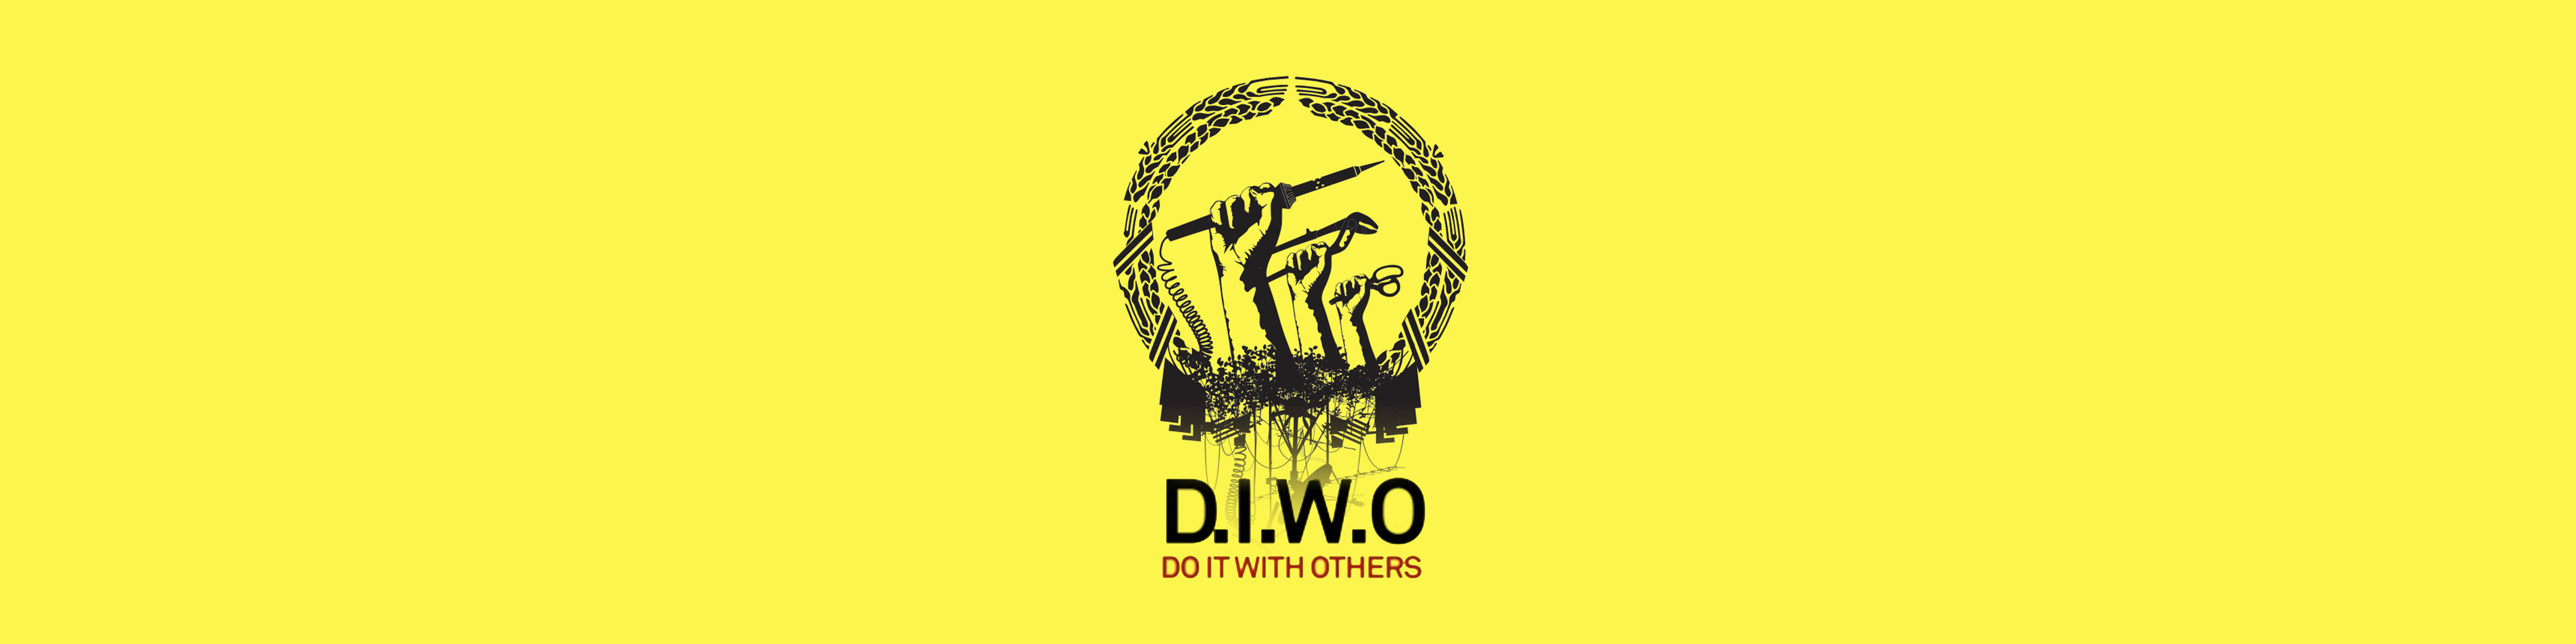 Diwo copy